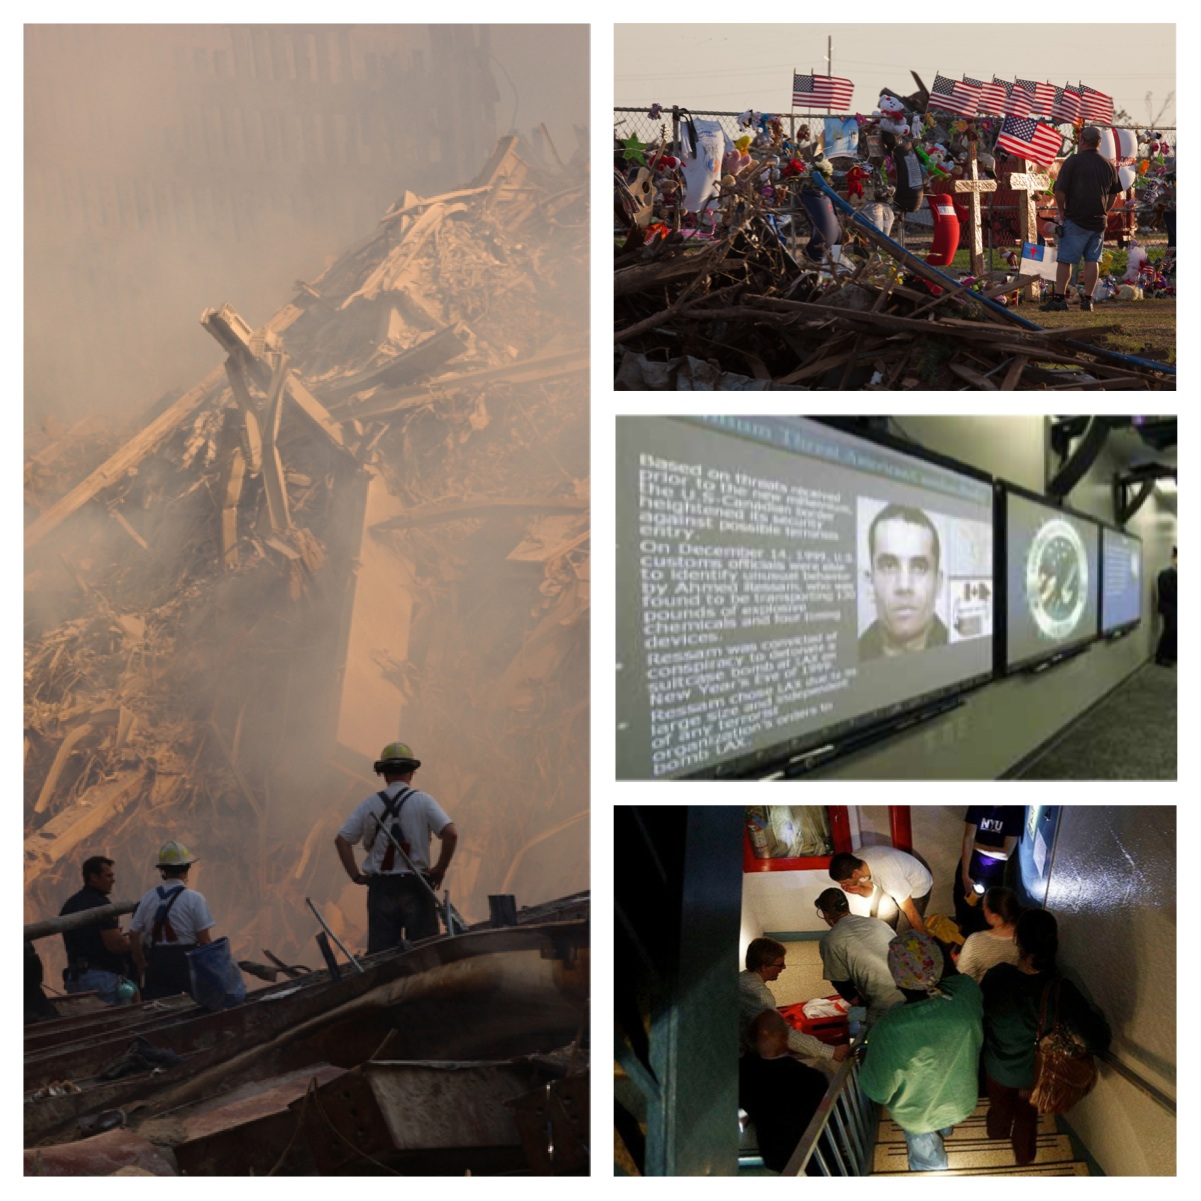 Photo Credit Left:Andrea Booher - Sep 12, 2001 , FEMA; Top Right:Andrea Booher - May 29, 2013, FEMA; Right Middle: FEMA Guardian Accord; Right Bottom: Hurricane Sandy